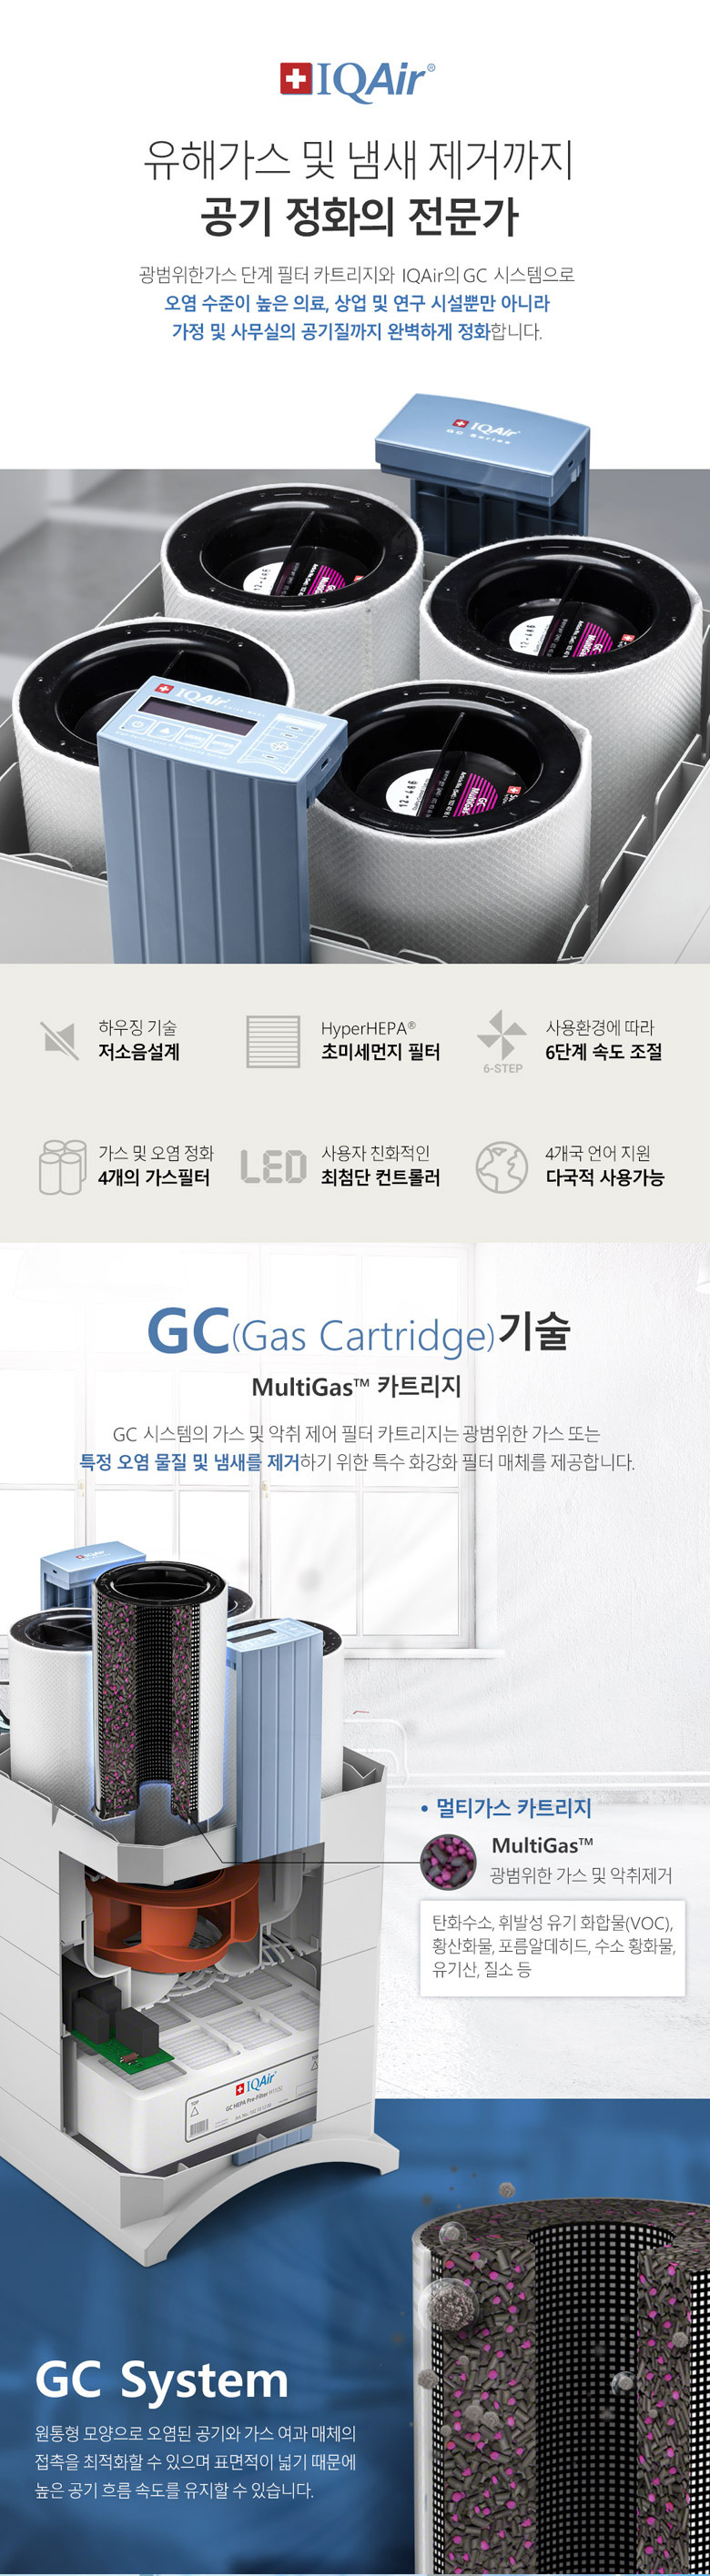 gc_multigas_03.jpg